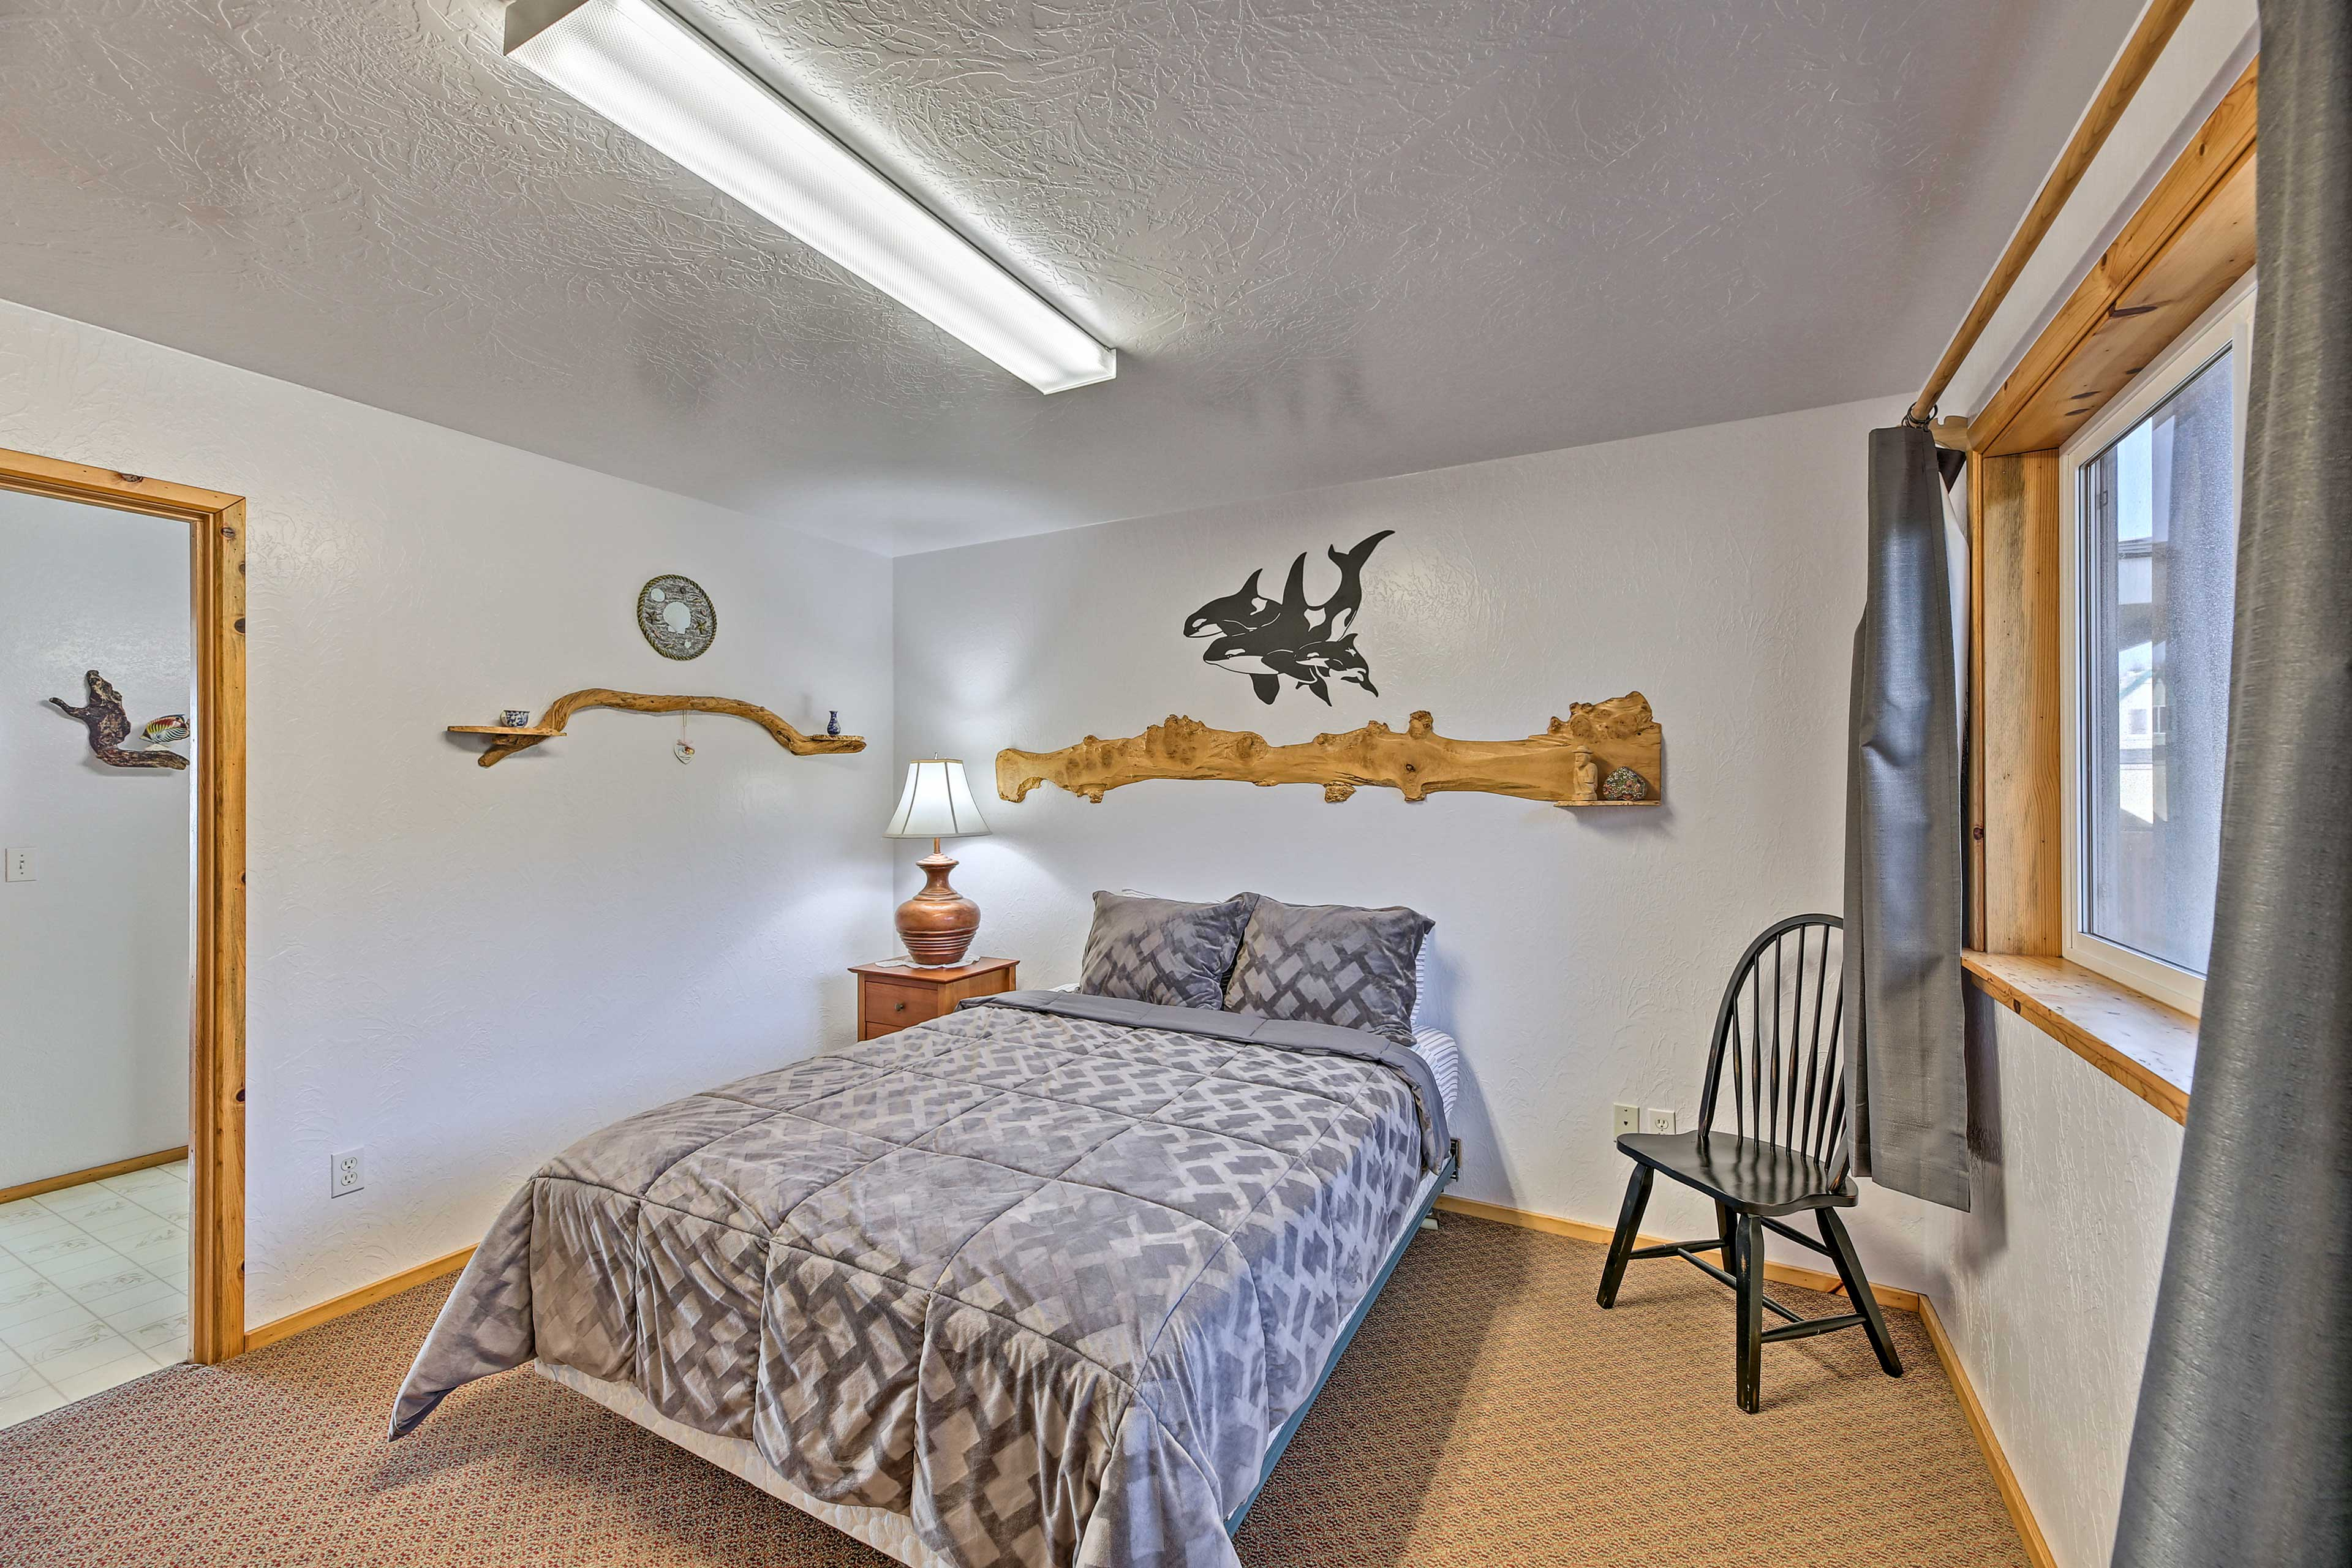 The master bedroom has tasteful raw wood shelves.